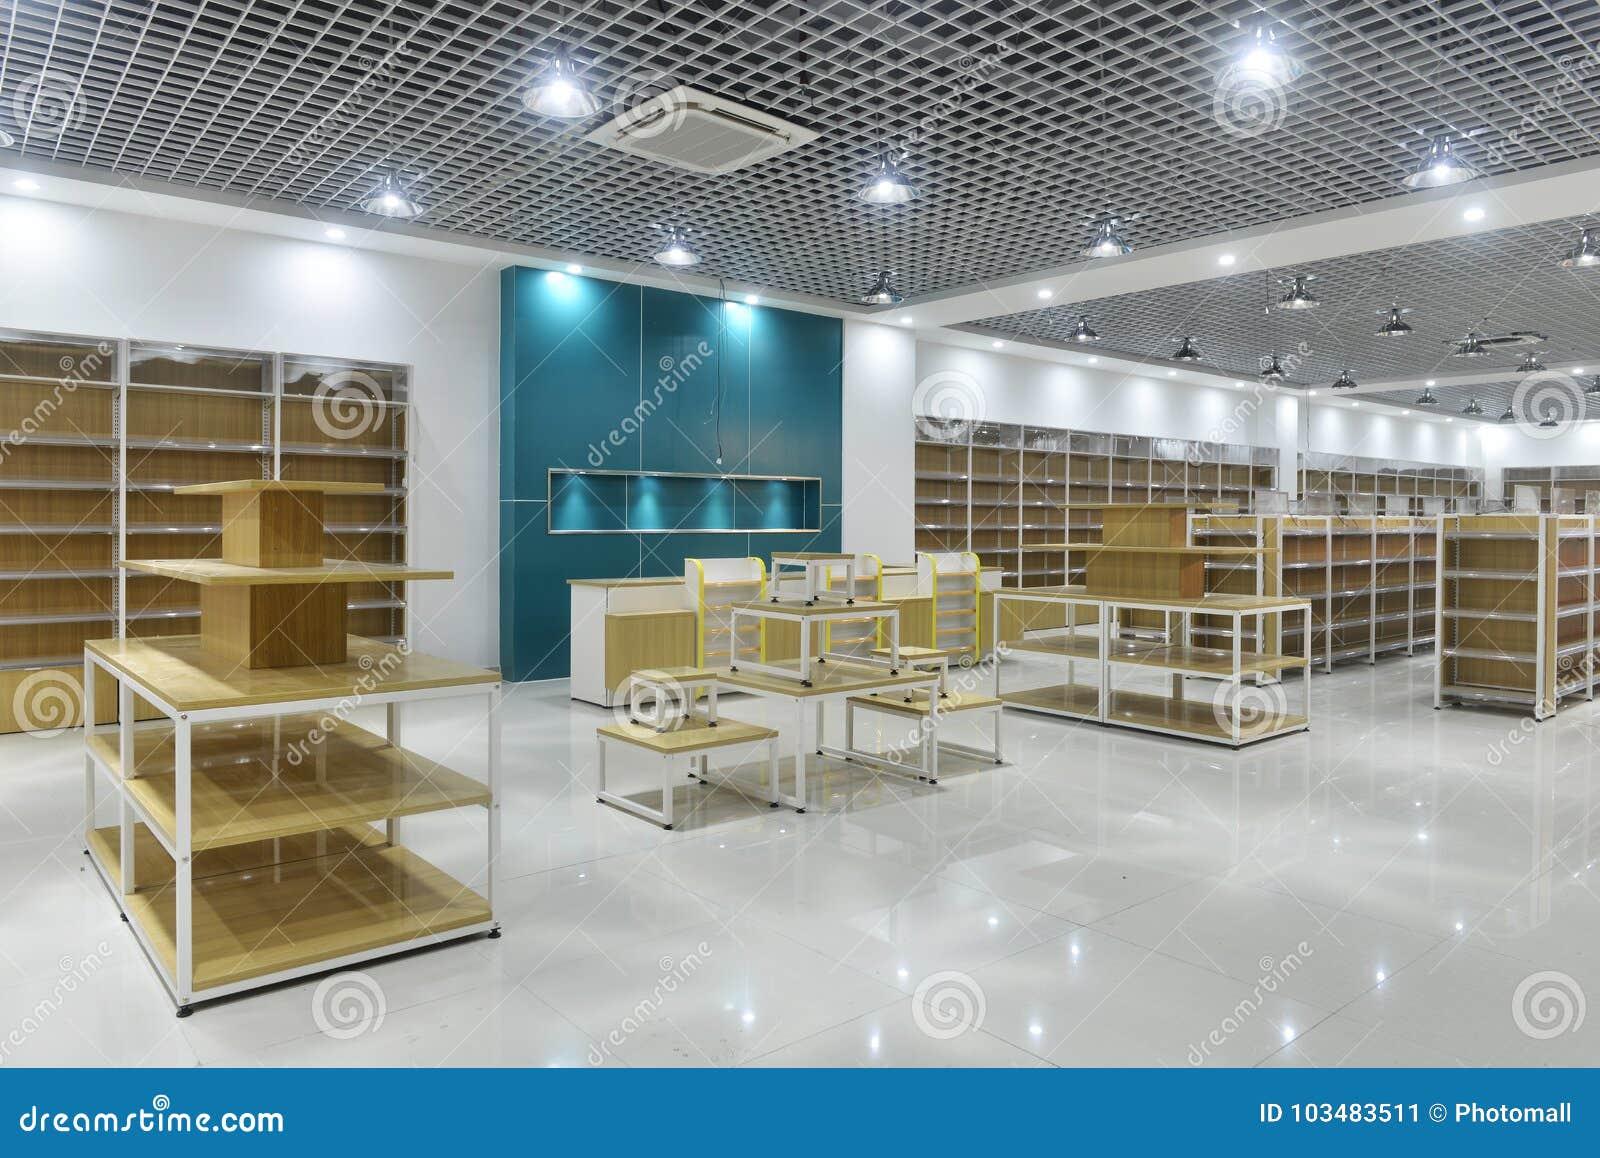 Empty store interior of supermarket